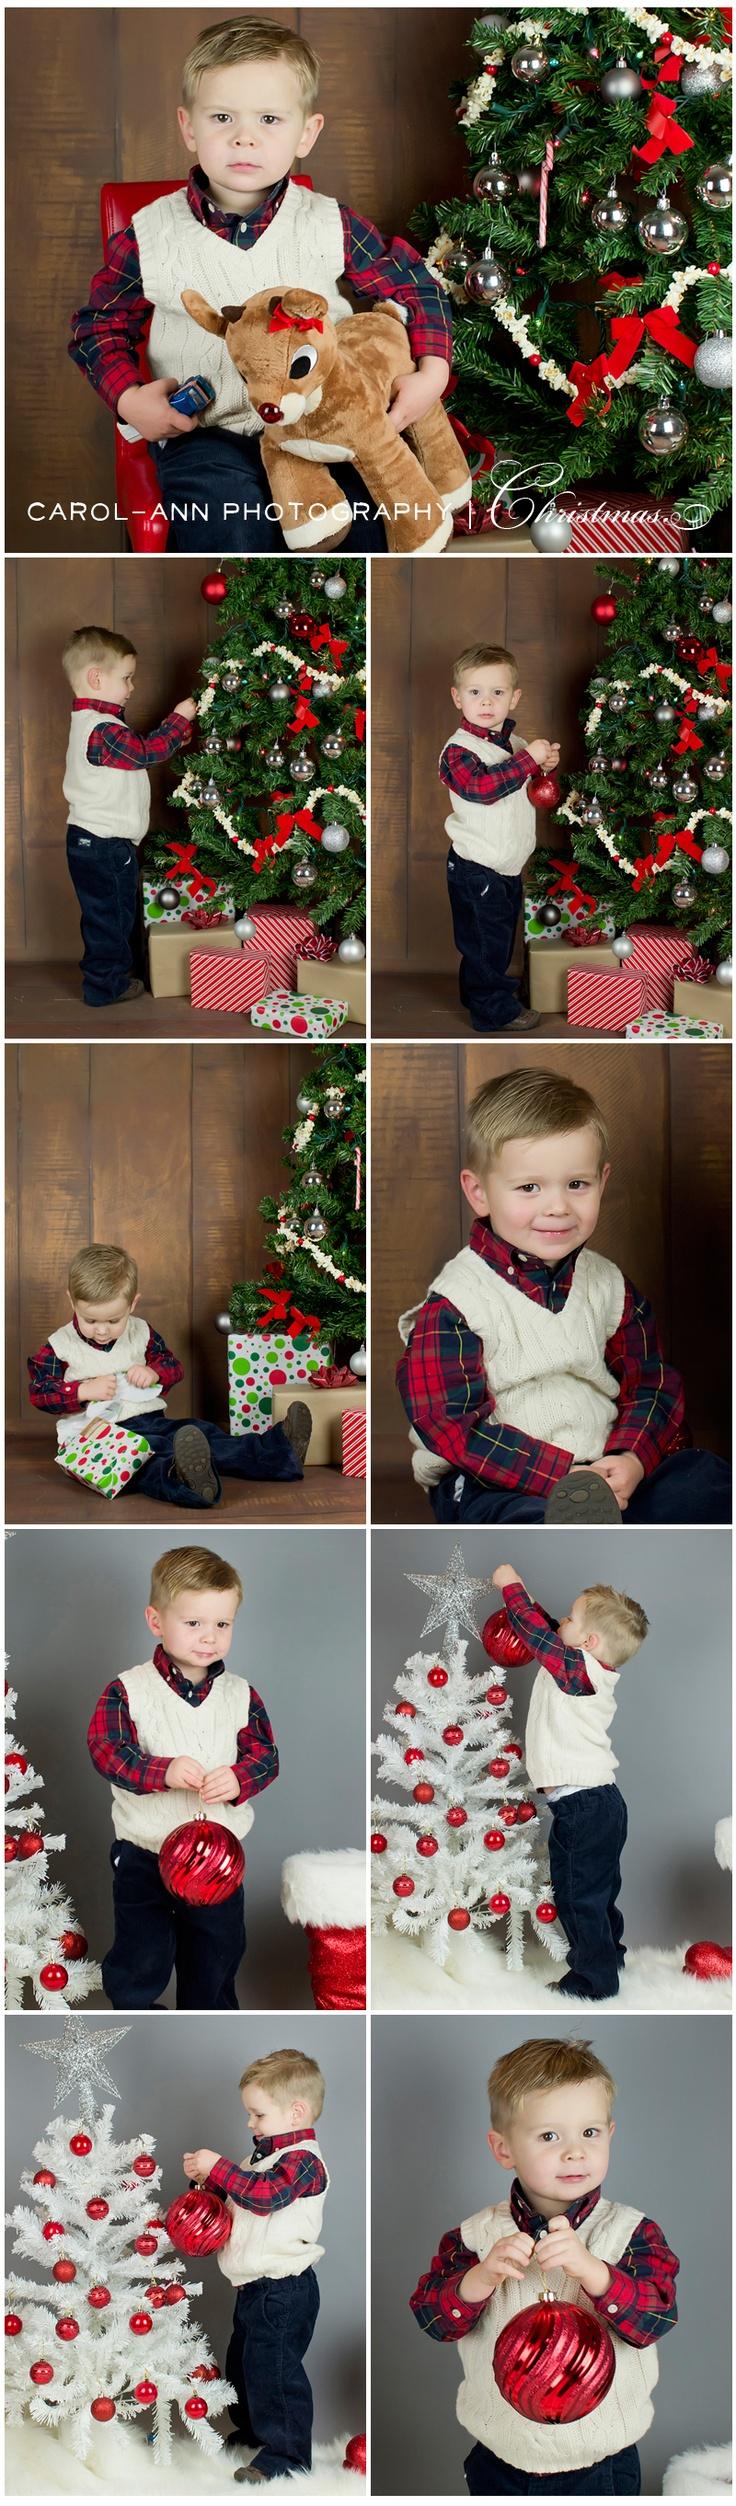 Carol-Ann Photography Christmas Mini Sessions